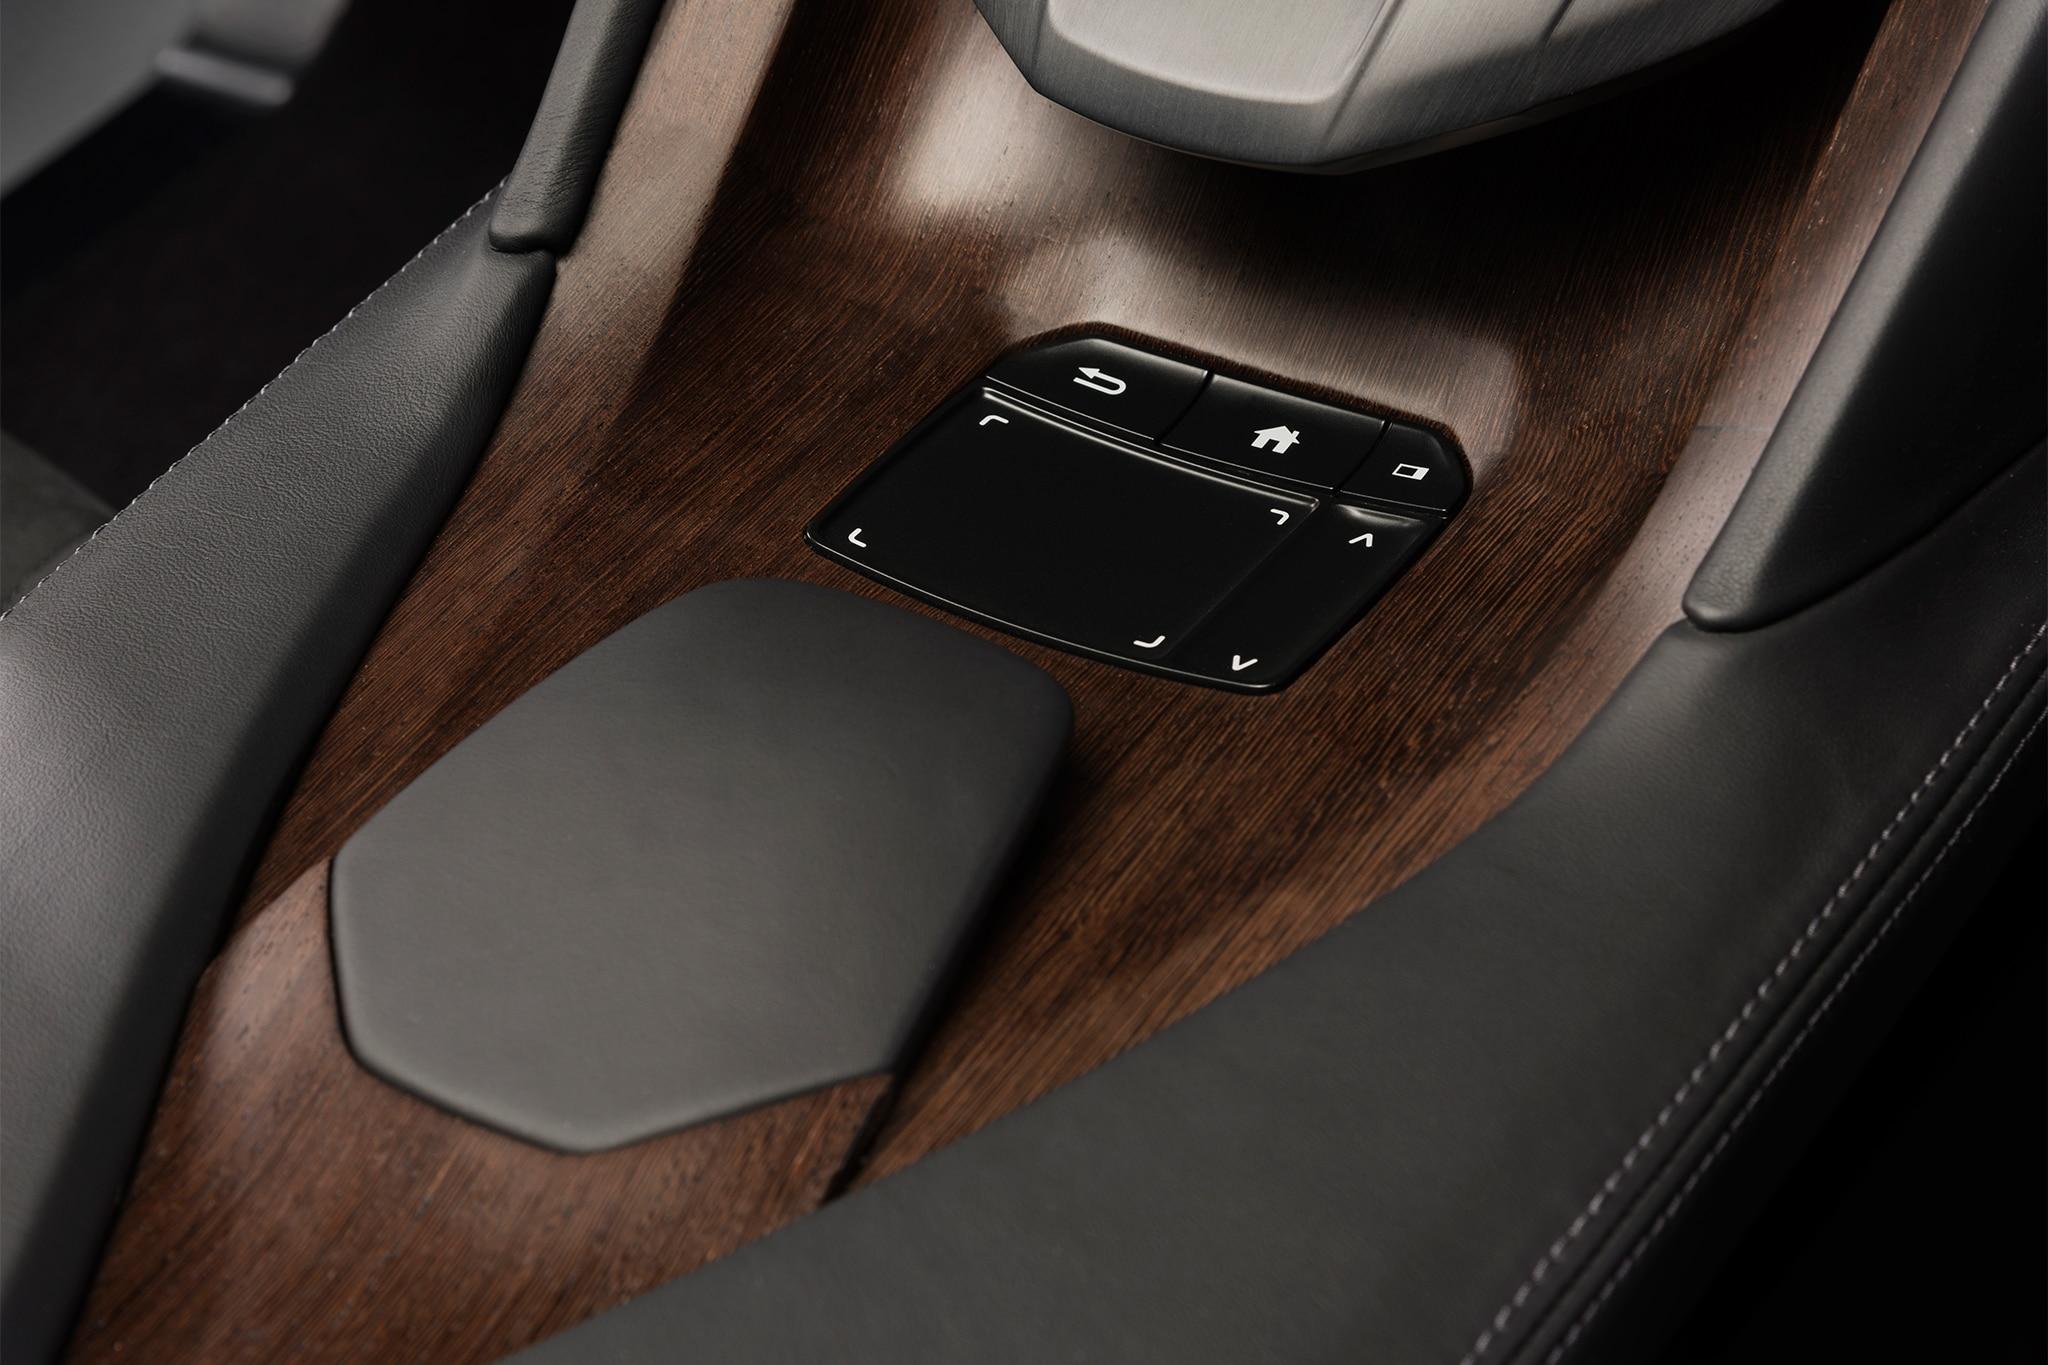 Acura Precision Cockpit concept touchpad